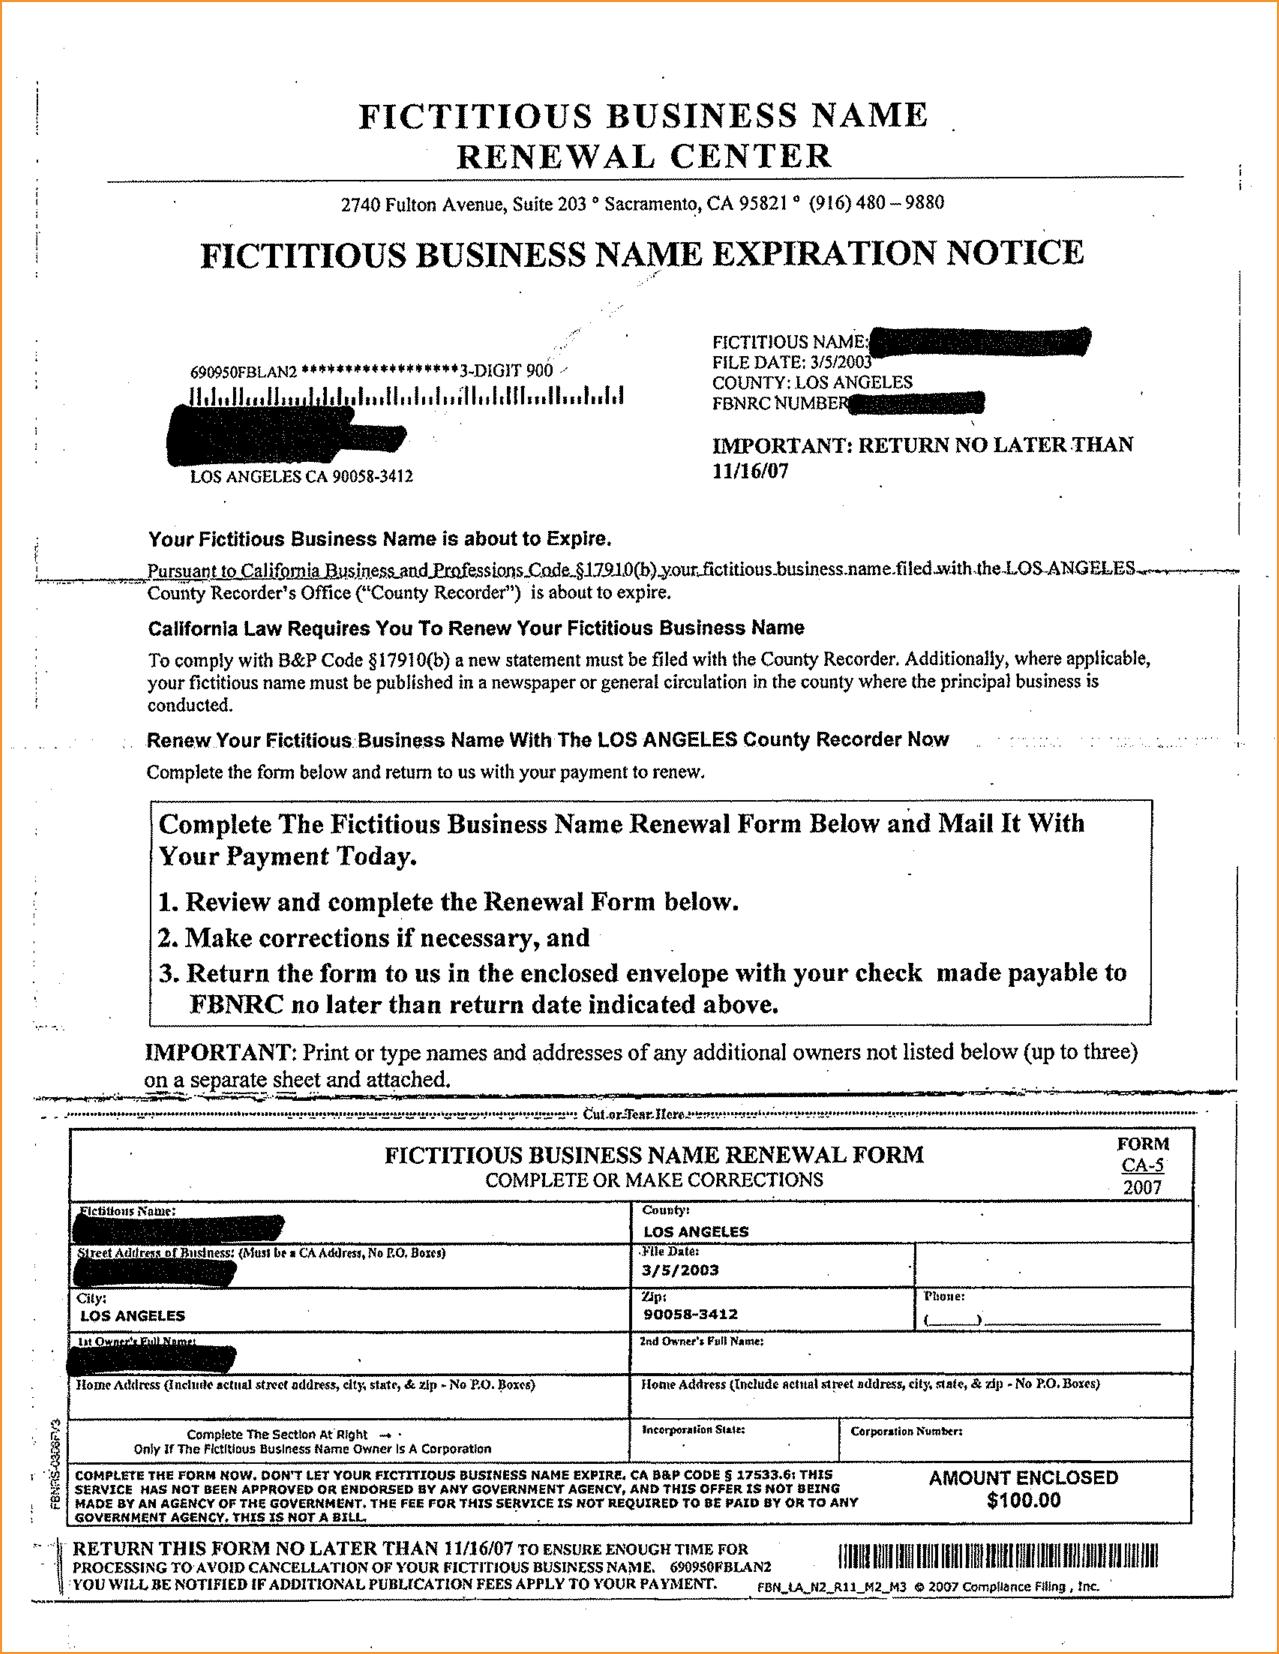 Fictitious Business Name.3278207 Questionnaire Template Within Fictitious Business Name San Francisco